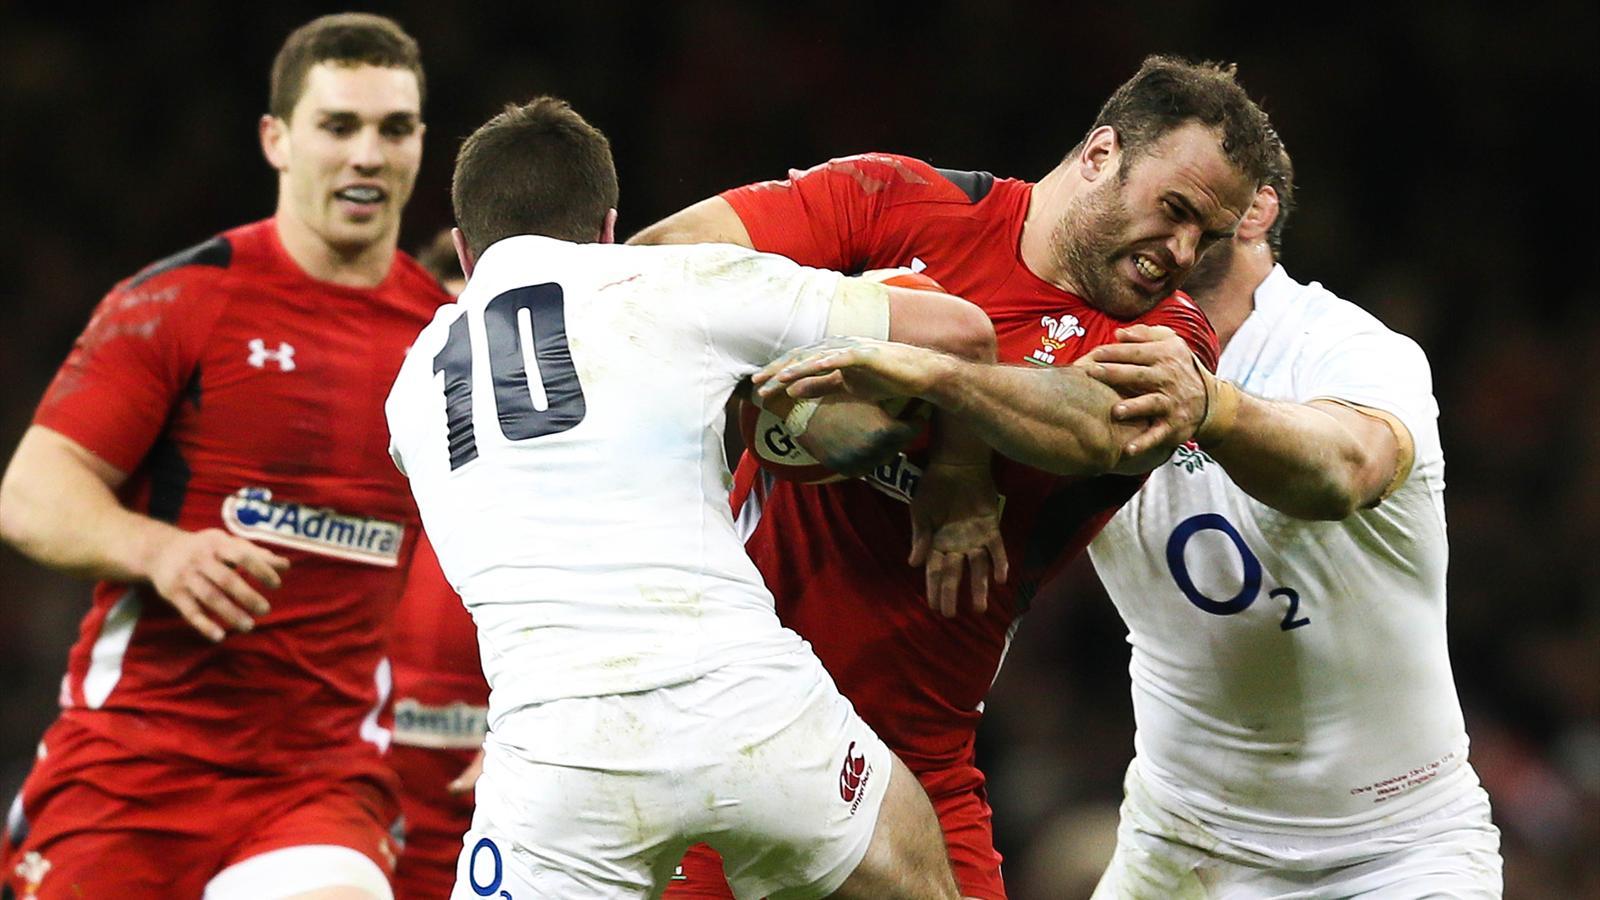 Rugby angleterre galles en chiffres depuis 8 ans - Coupe du monde de rugby en angleterre ...